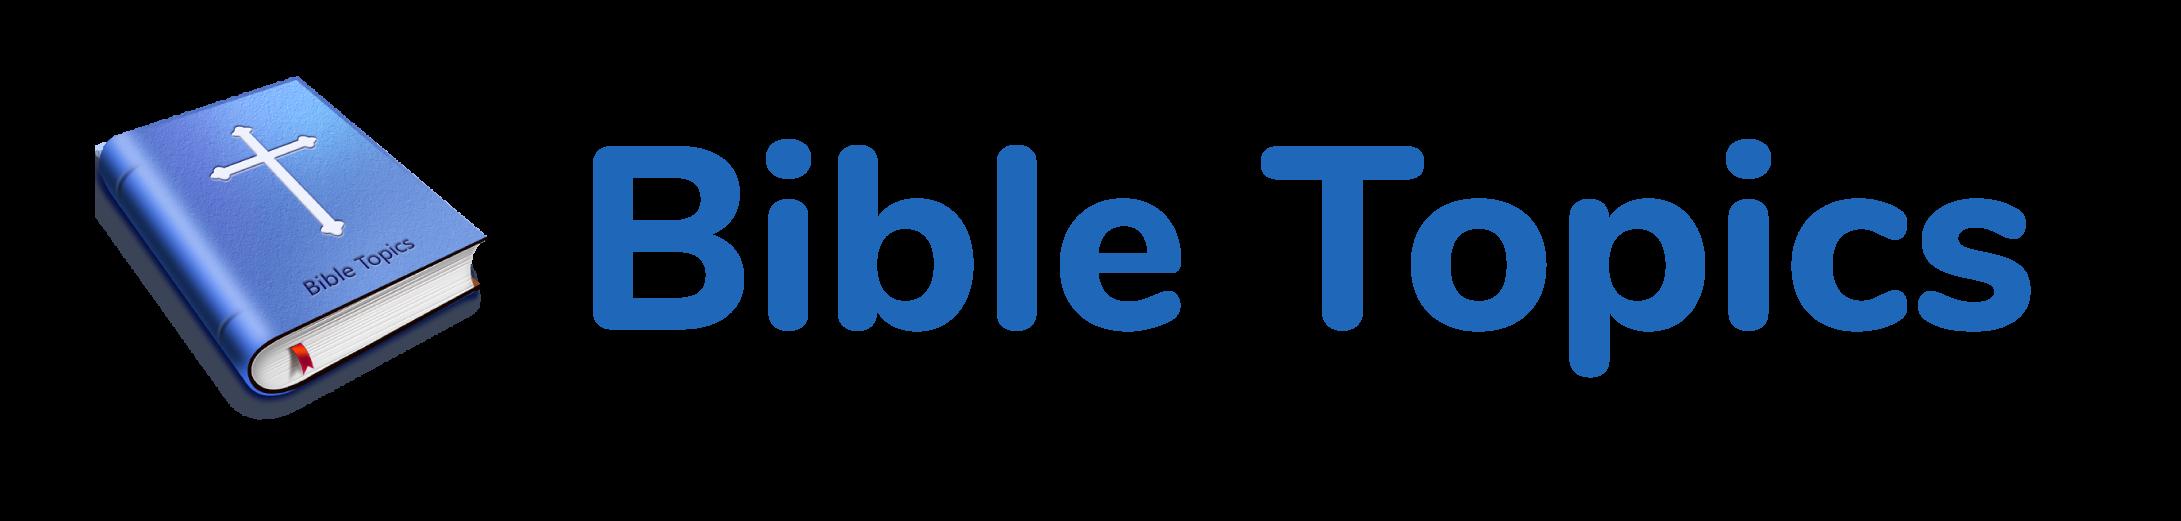 Bible Topics App